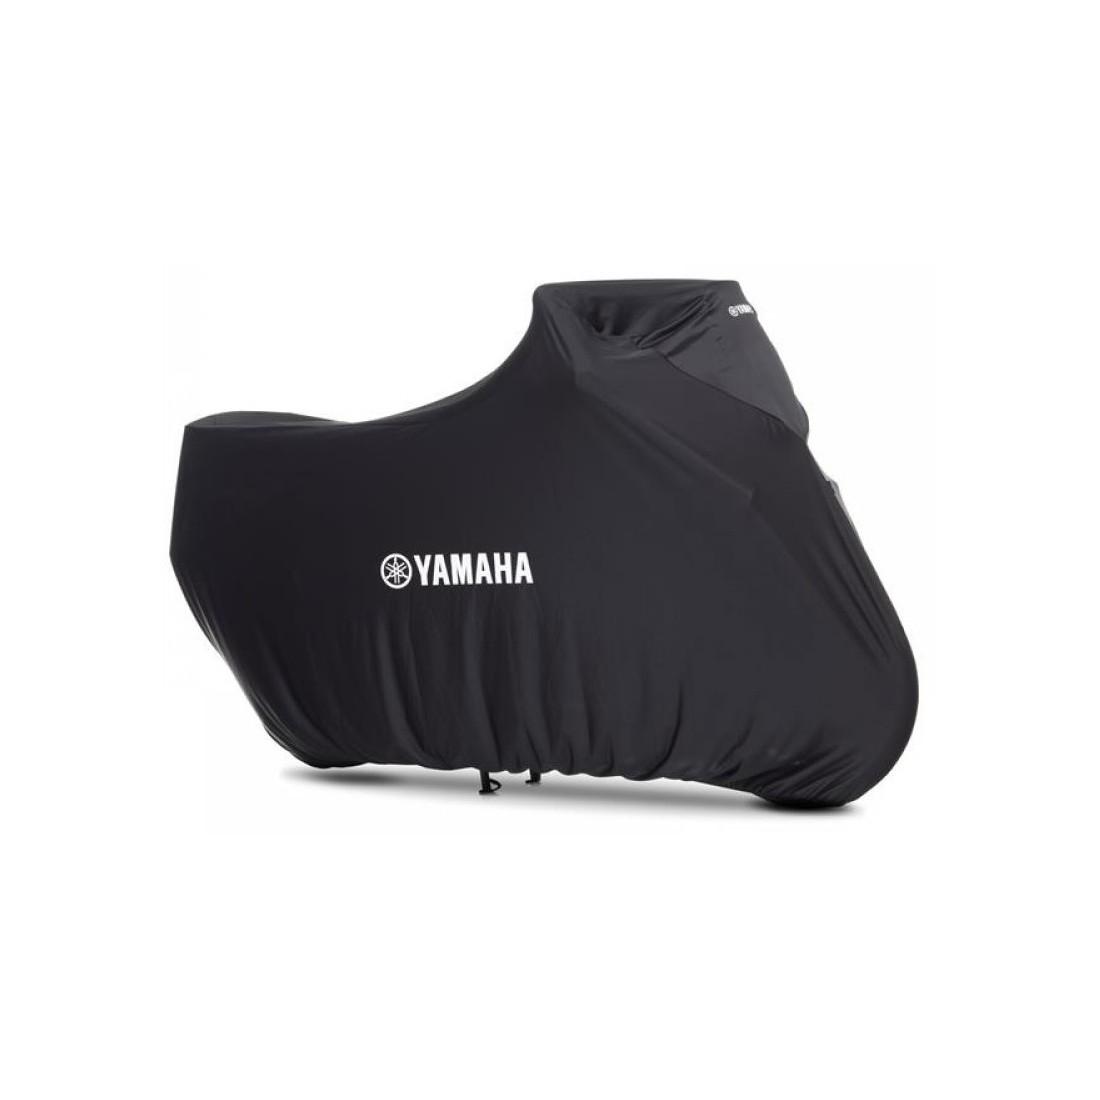 Funda de Interior Mediana Yamaha Negro